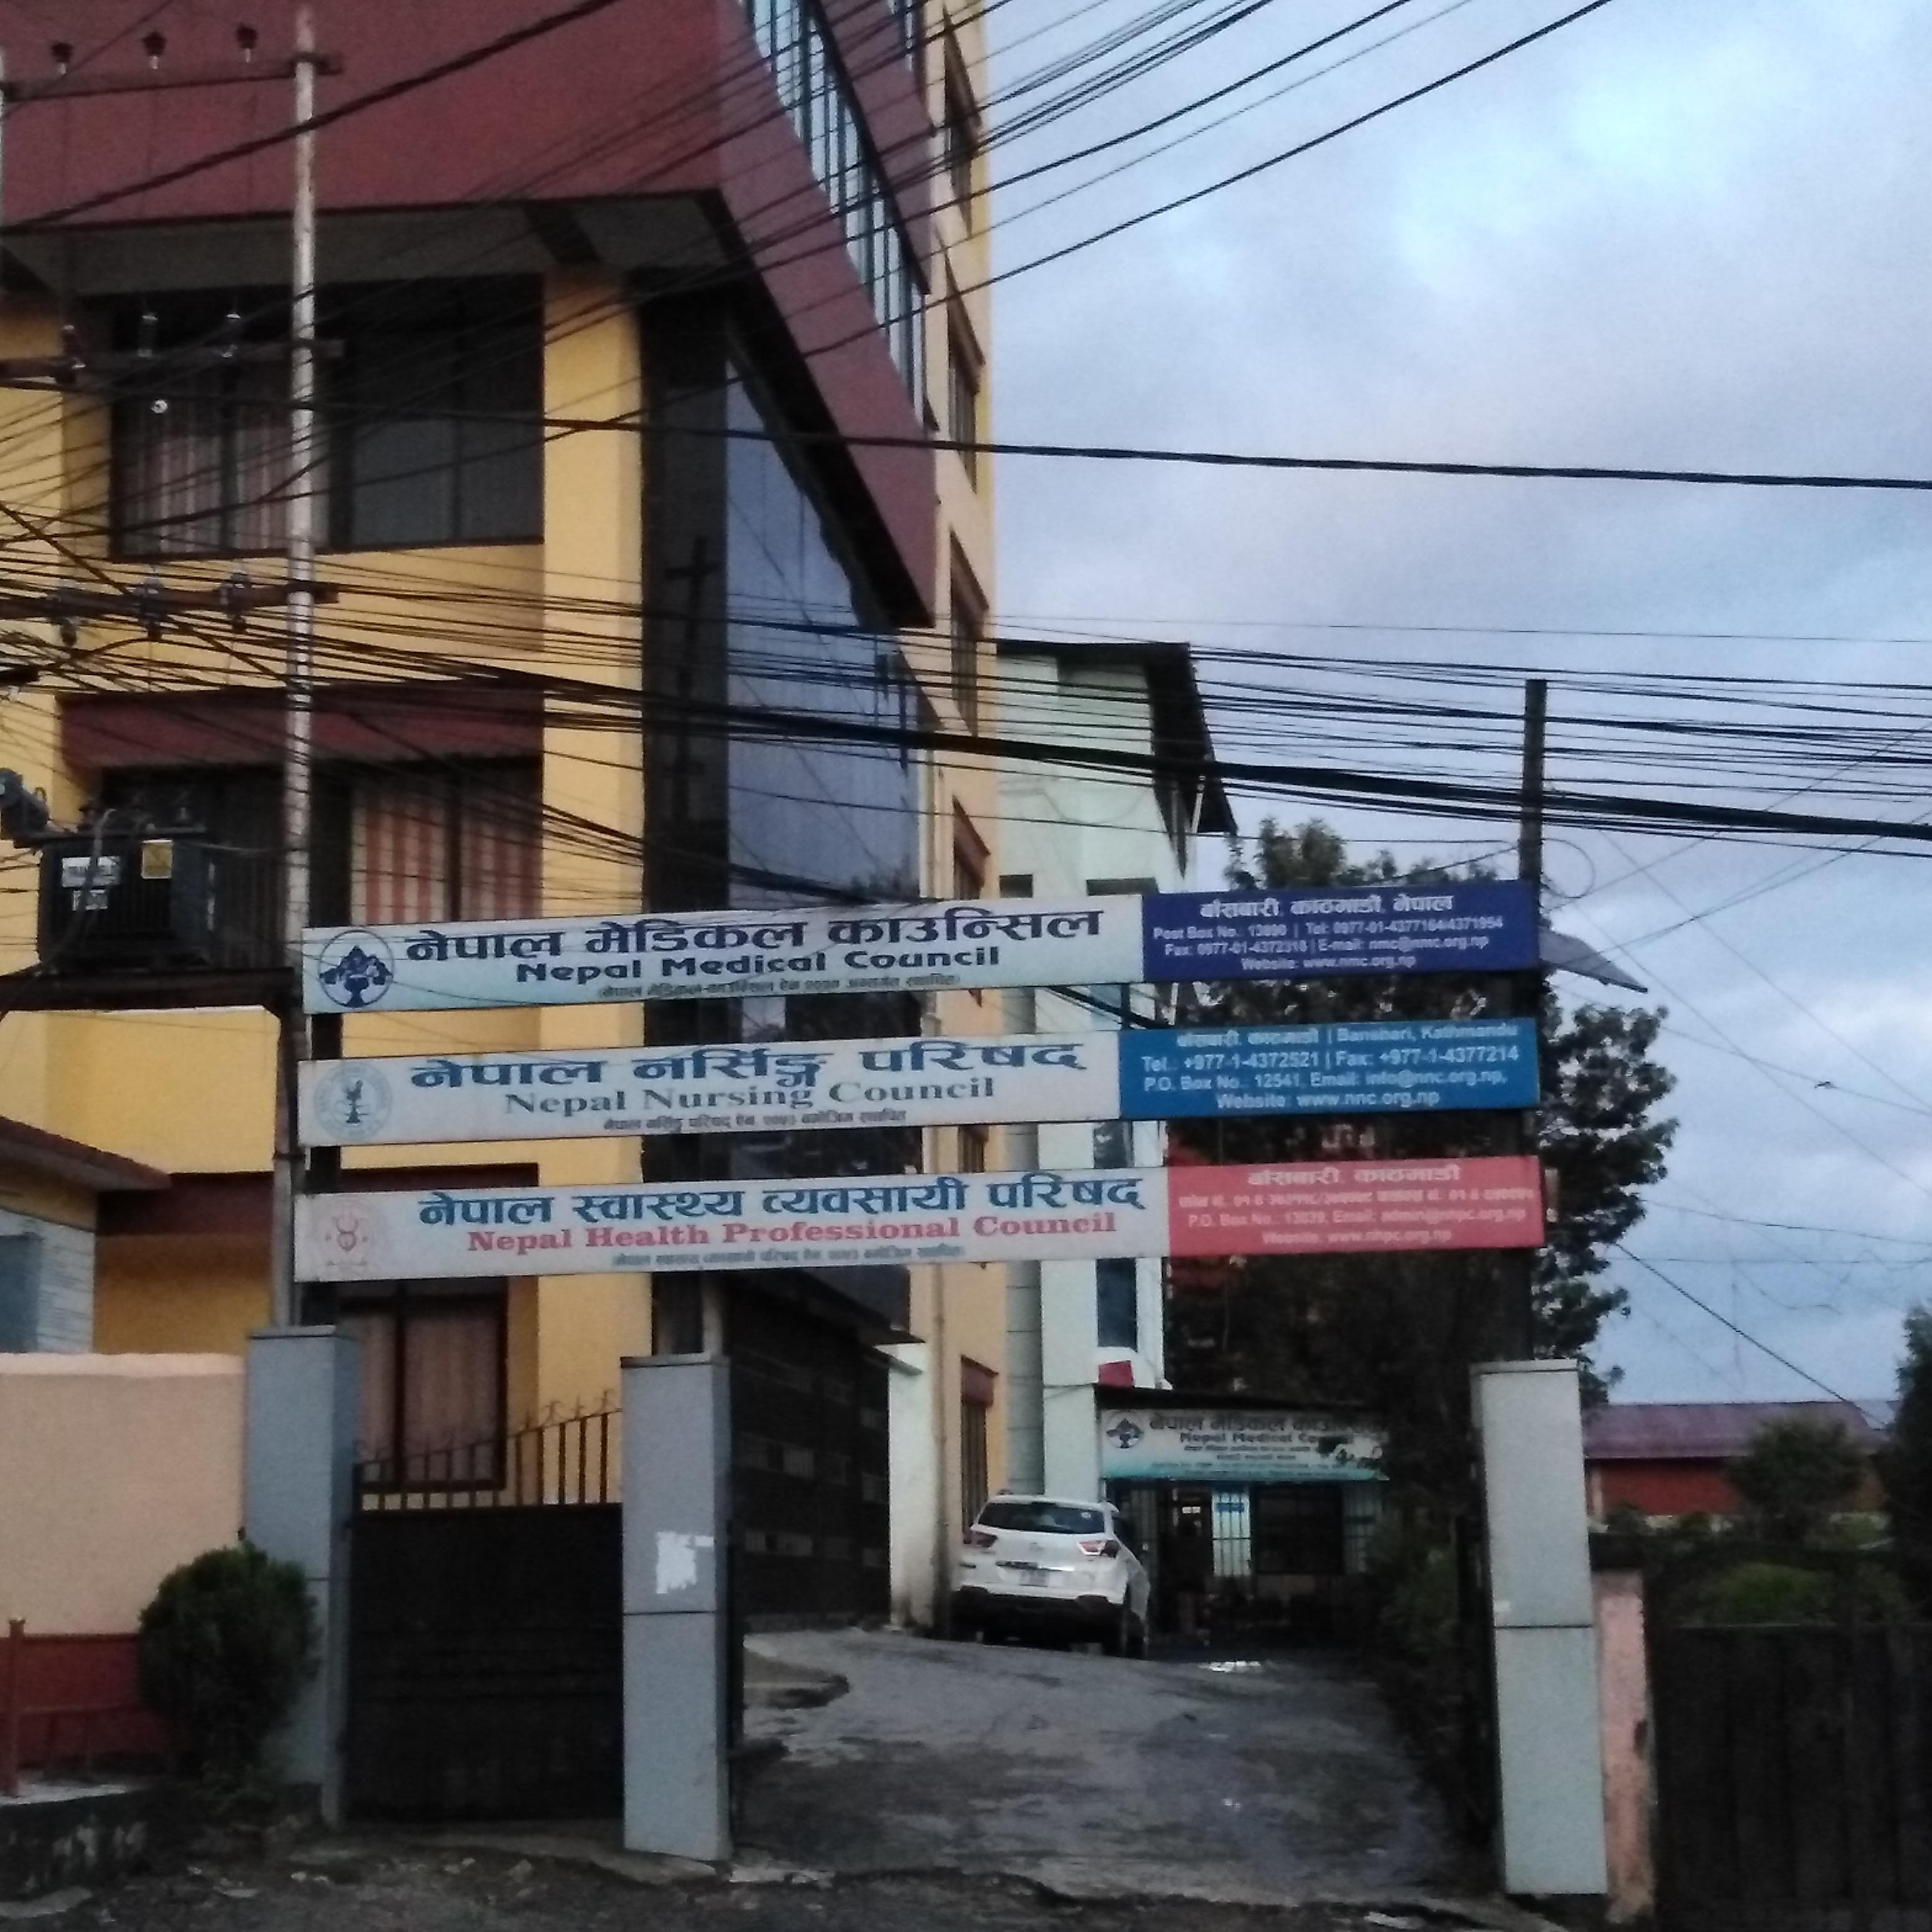 A view of Nepal Medical Council, Nepal Nursing Council, and Nepal Health Professional Council in Kathmandu, Nepal. Photo: Sandeep Sen/ THT Online